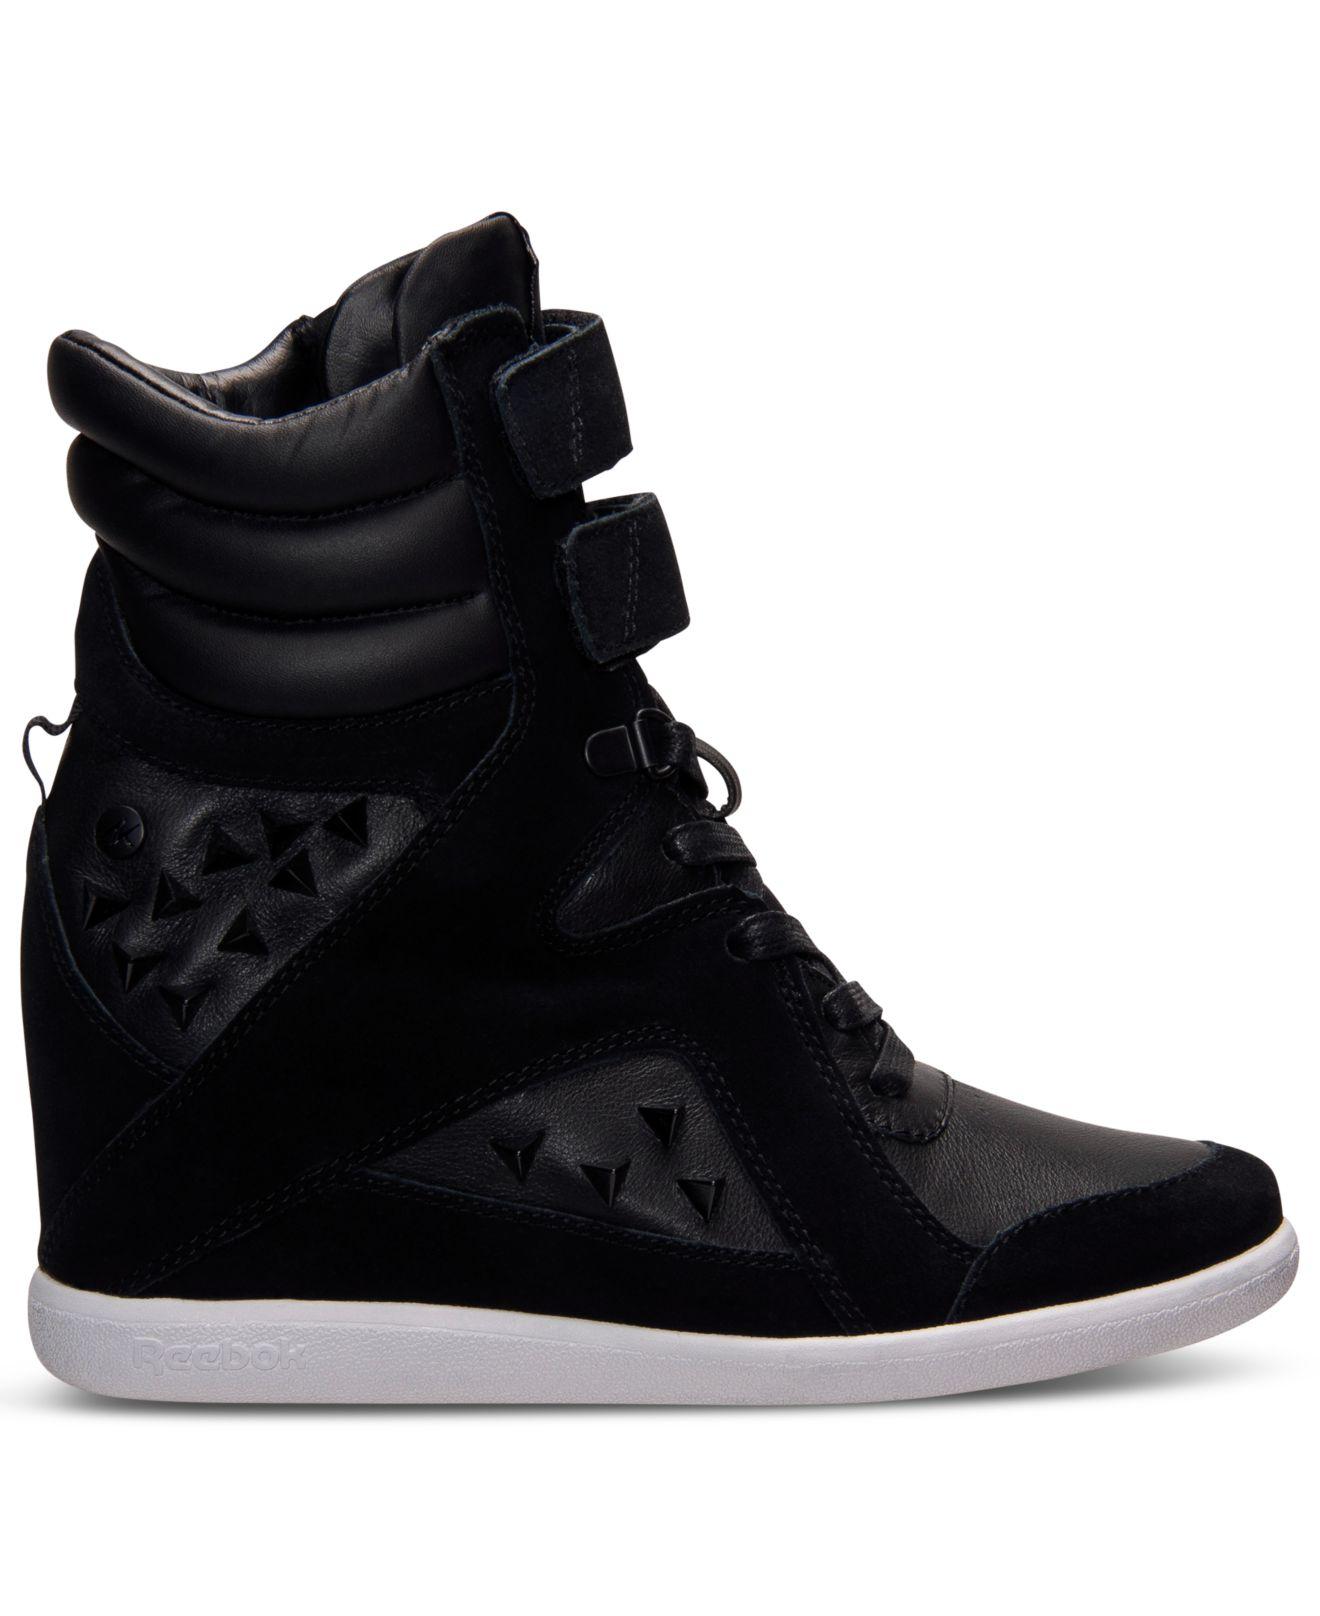 19f238d156b2 Lyst - Reebok Women S Alicia Keys Wedge Casual Sneakers From Finish ...